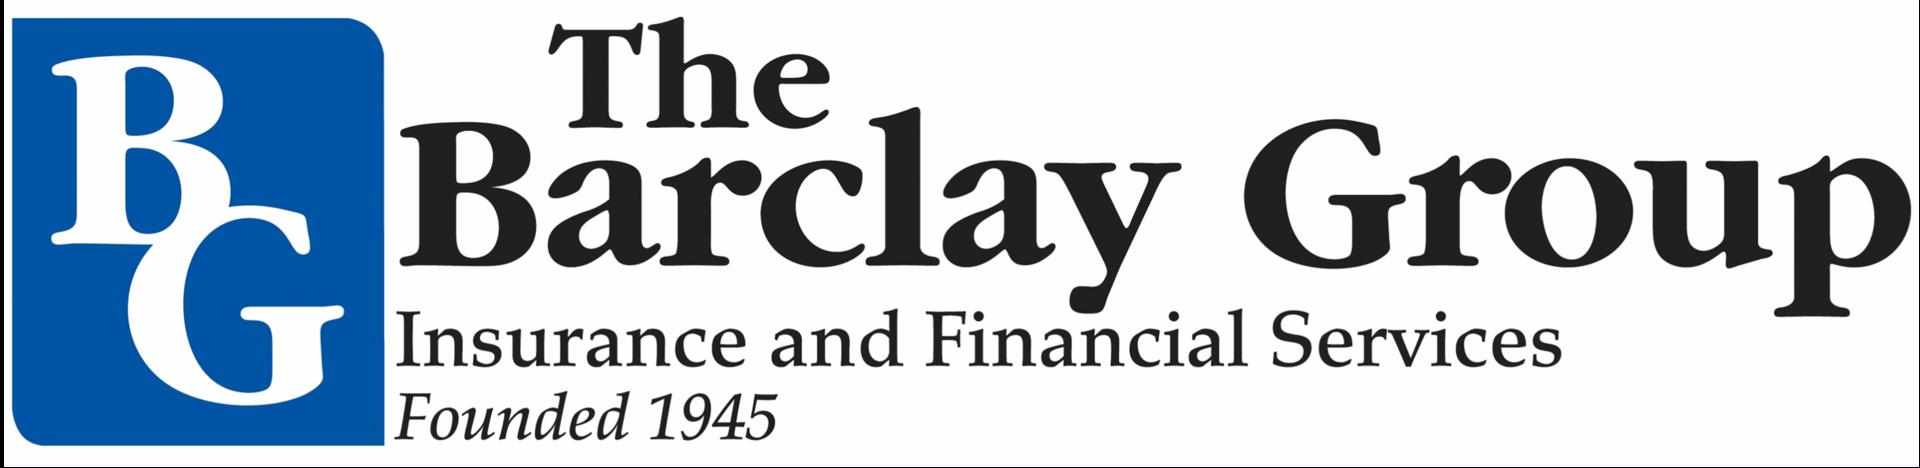 Barclay Group Logo